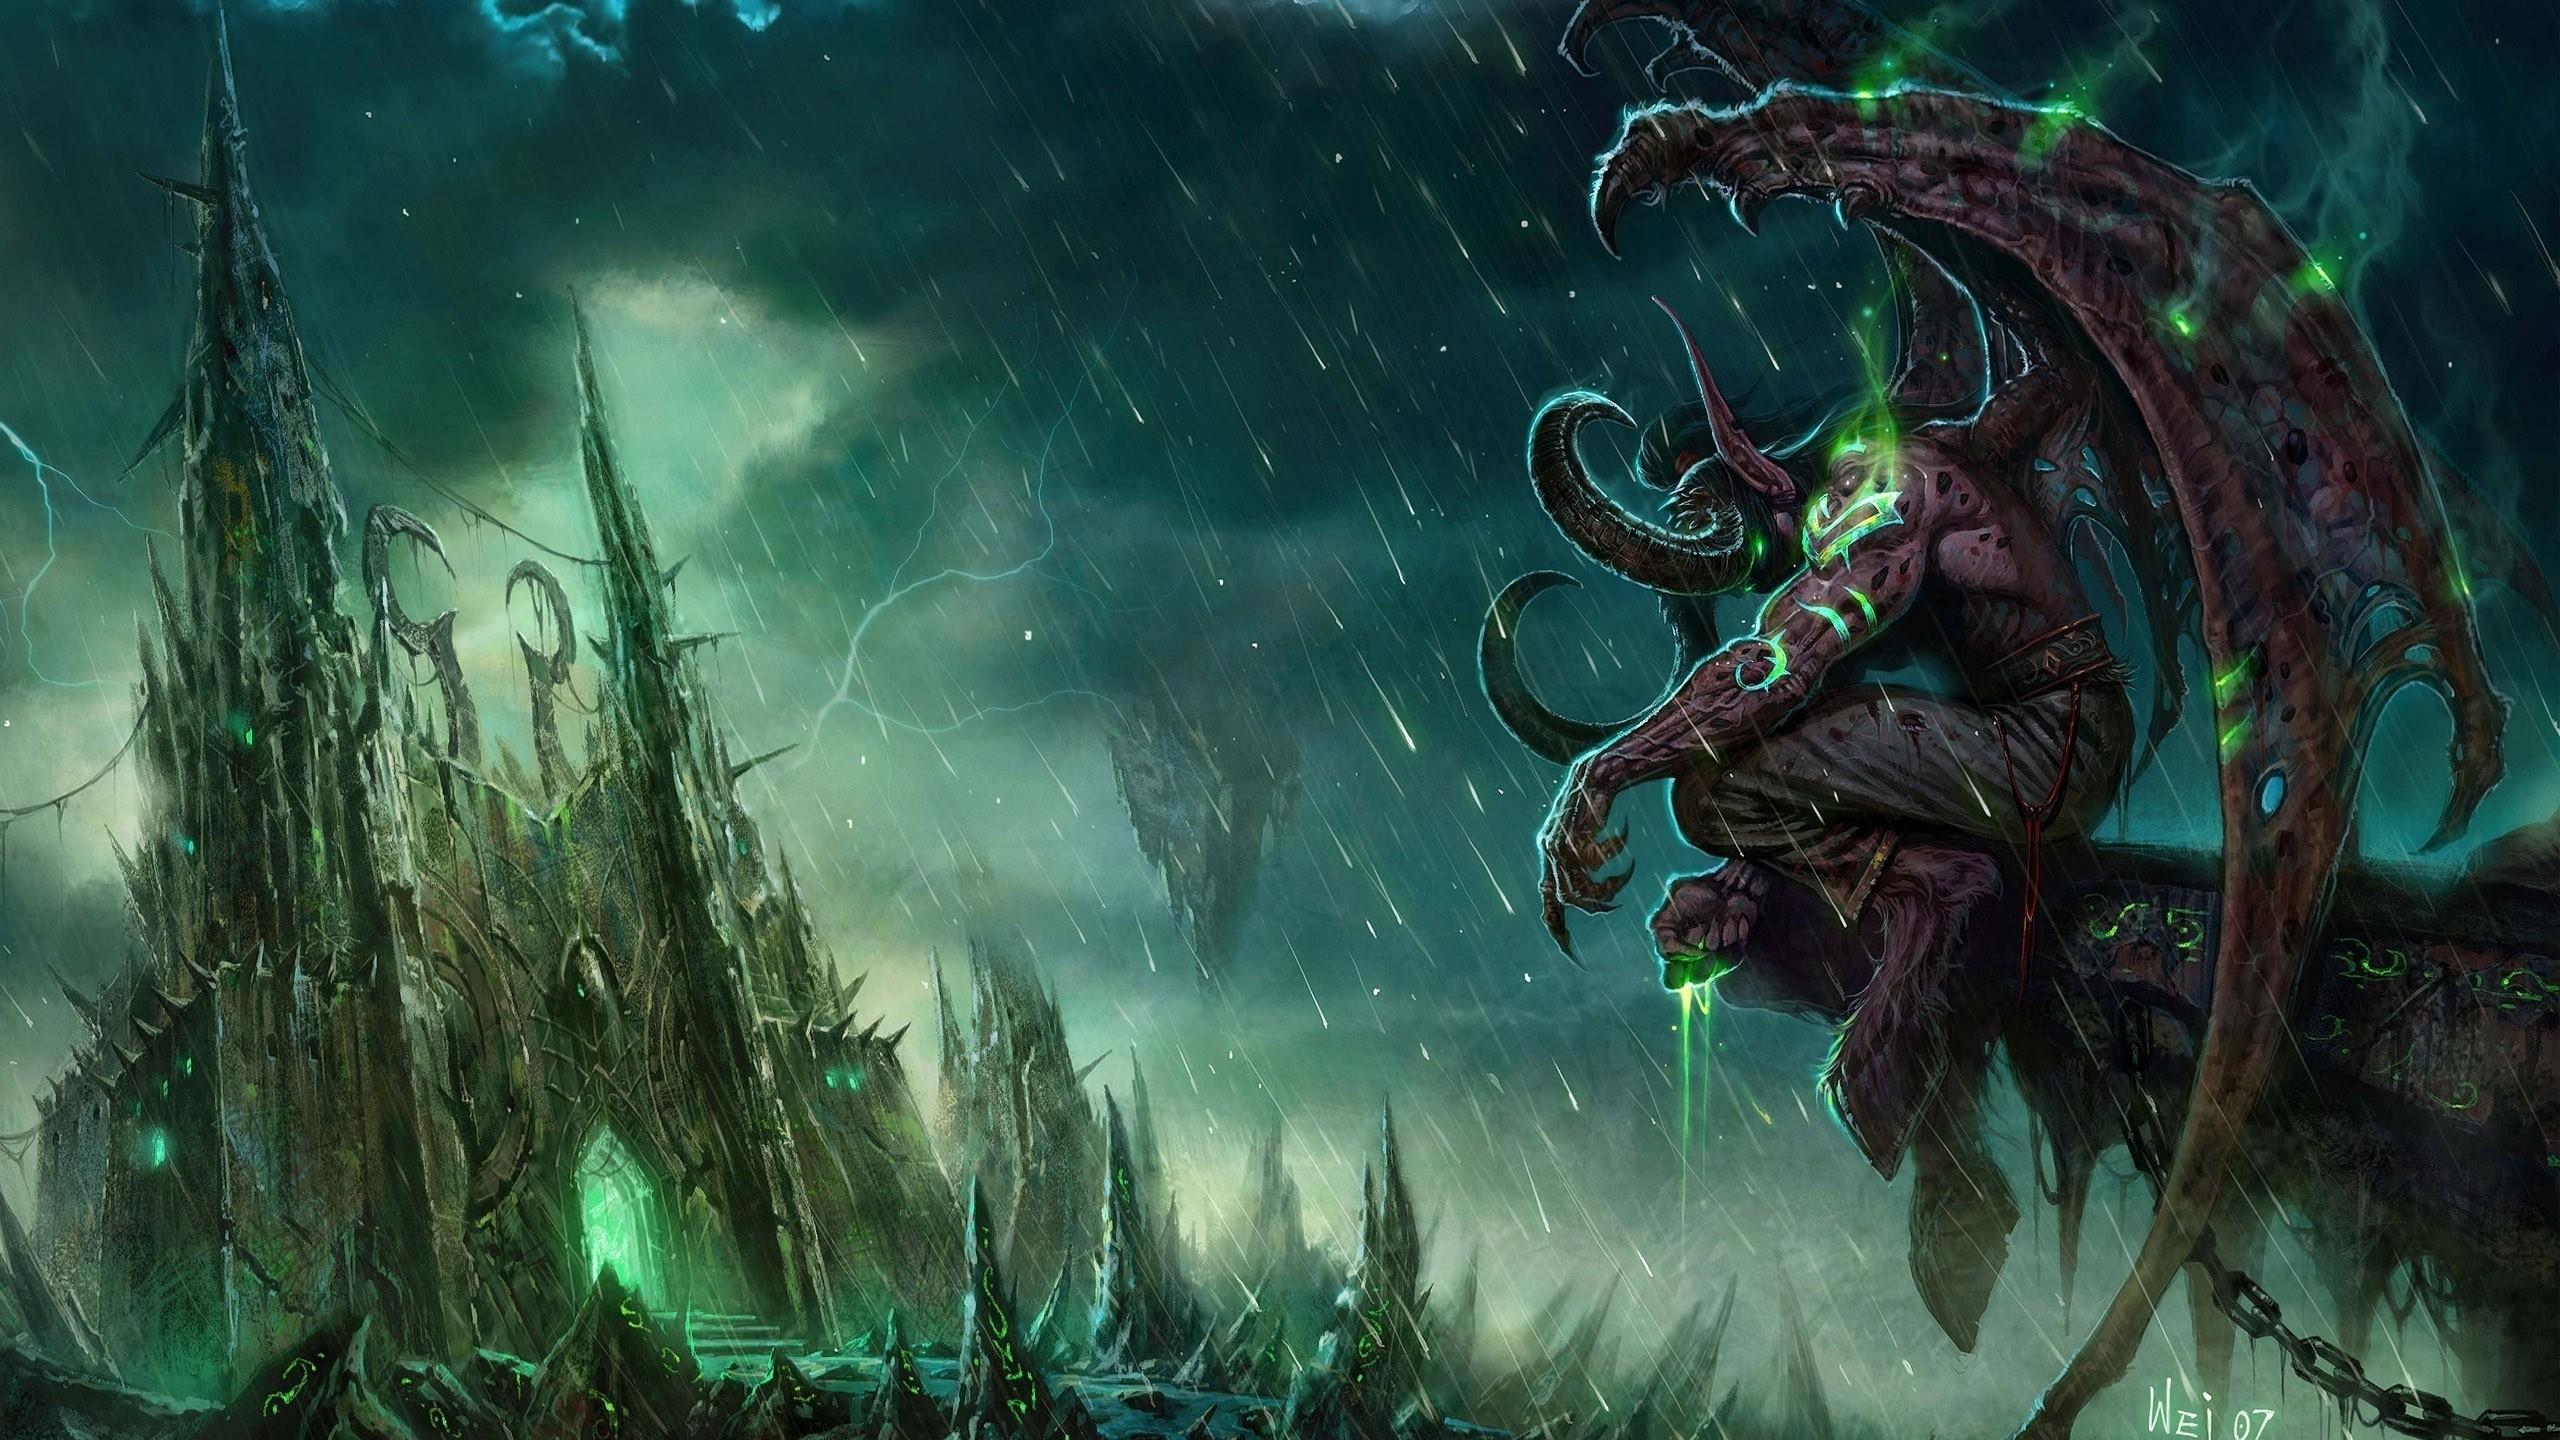 Wallpaper Video Games Illidan Stormrage Mythology World